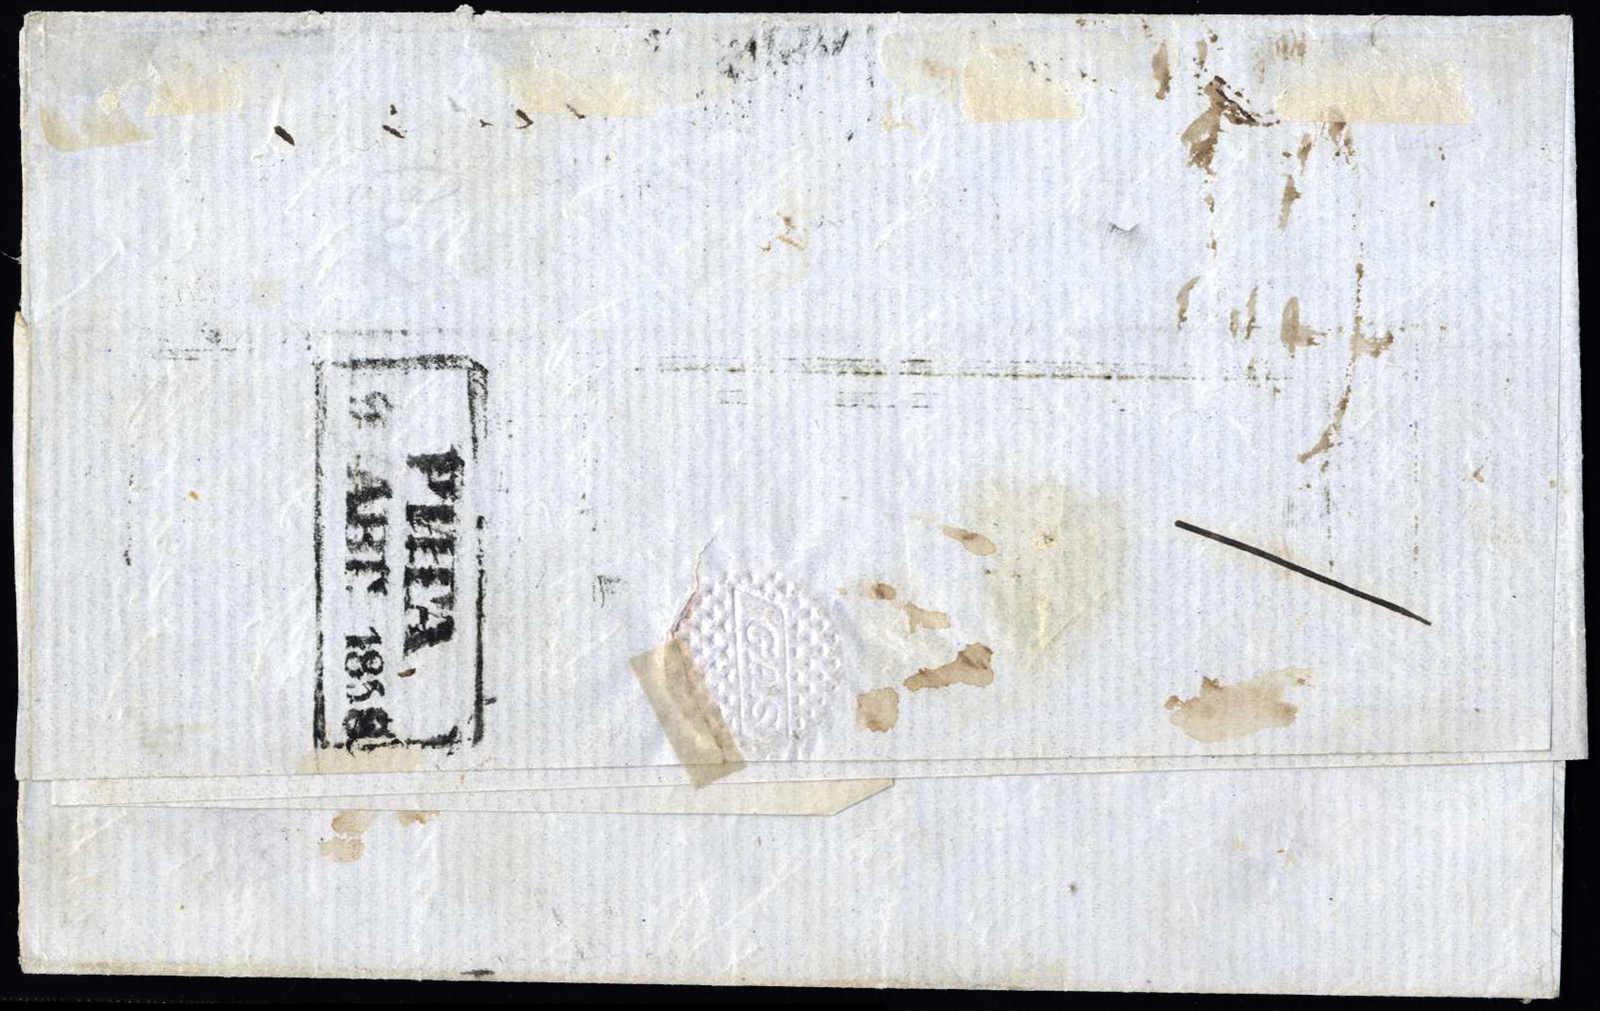 Lot 383 - europa lettland -  HA HARMERS AUCTIONS S.A. Treasure Hunt 3